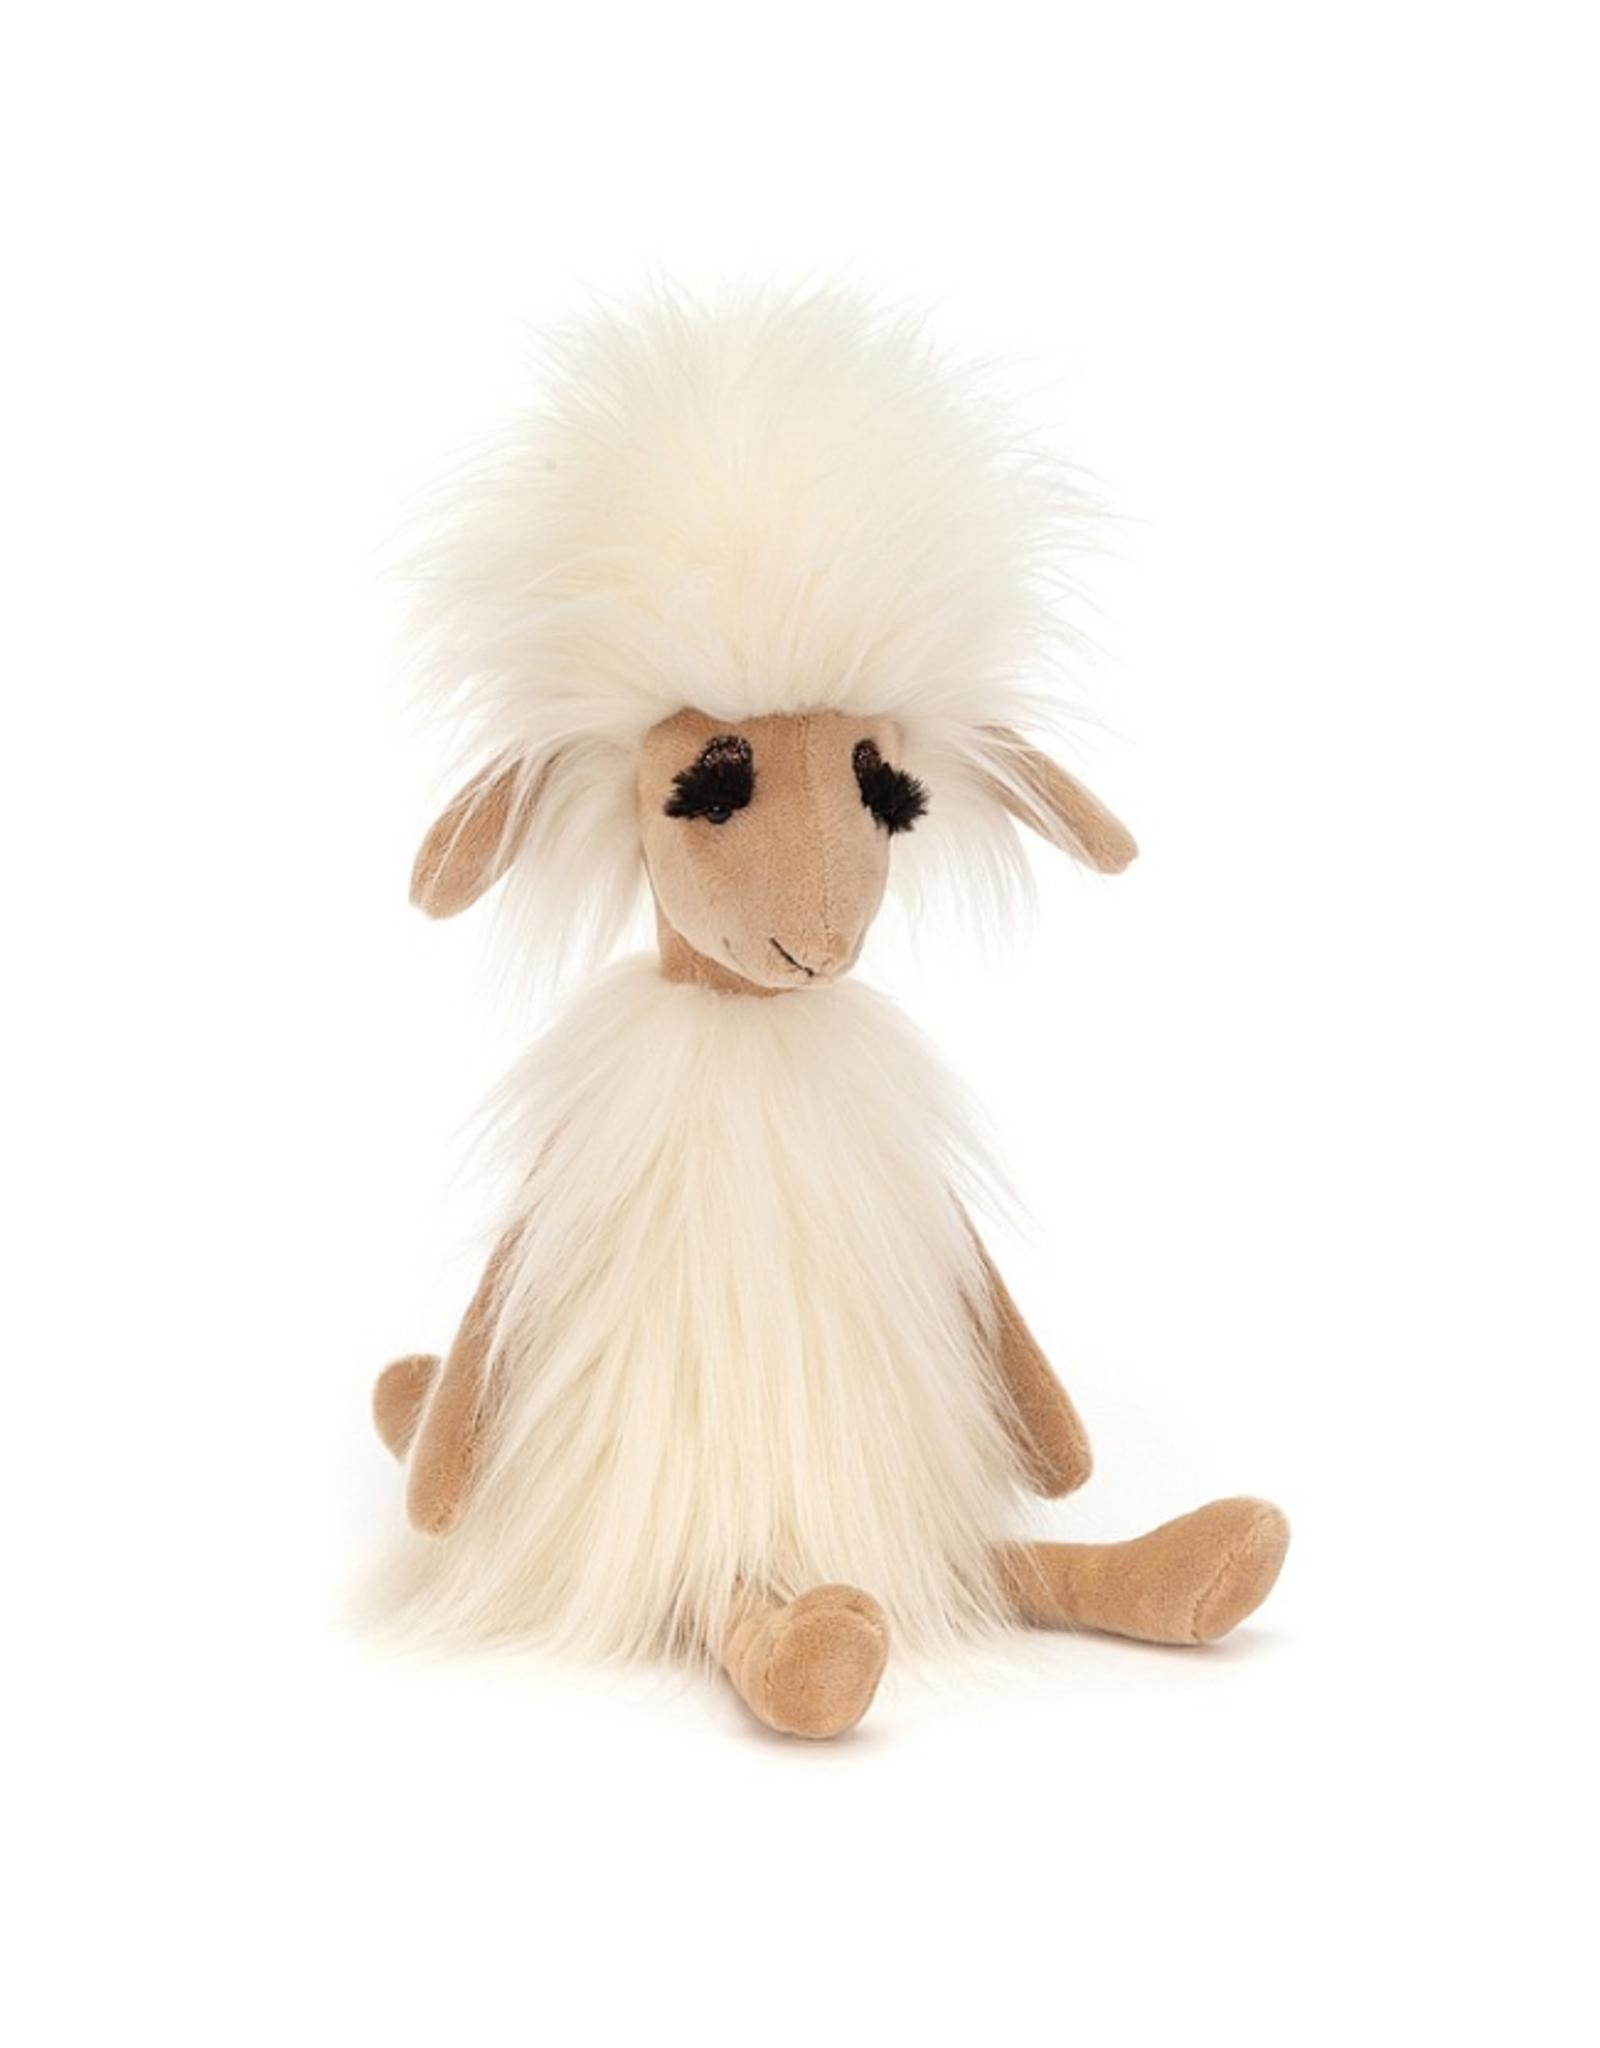 JellyCat - Swellegant Sheep